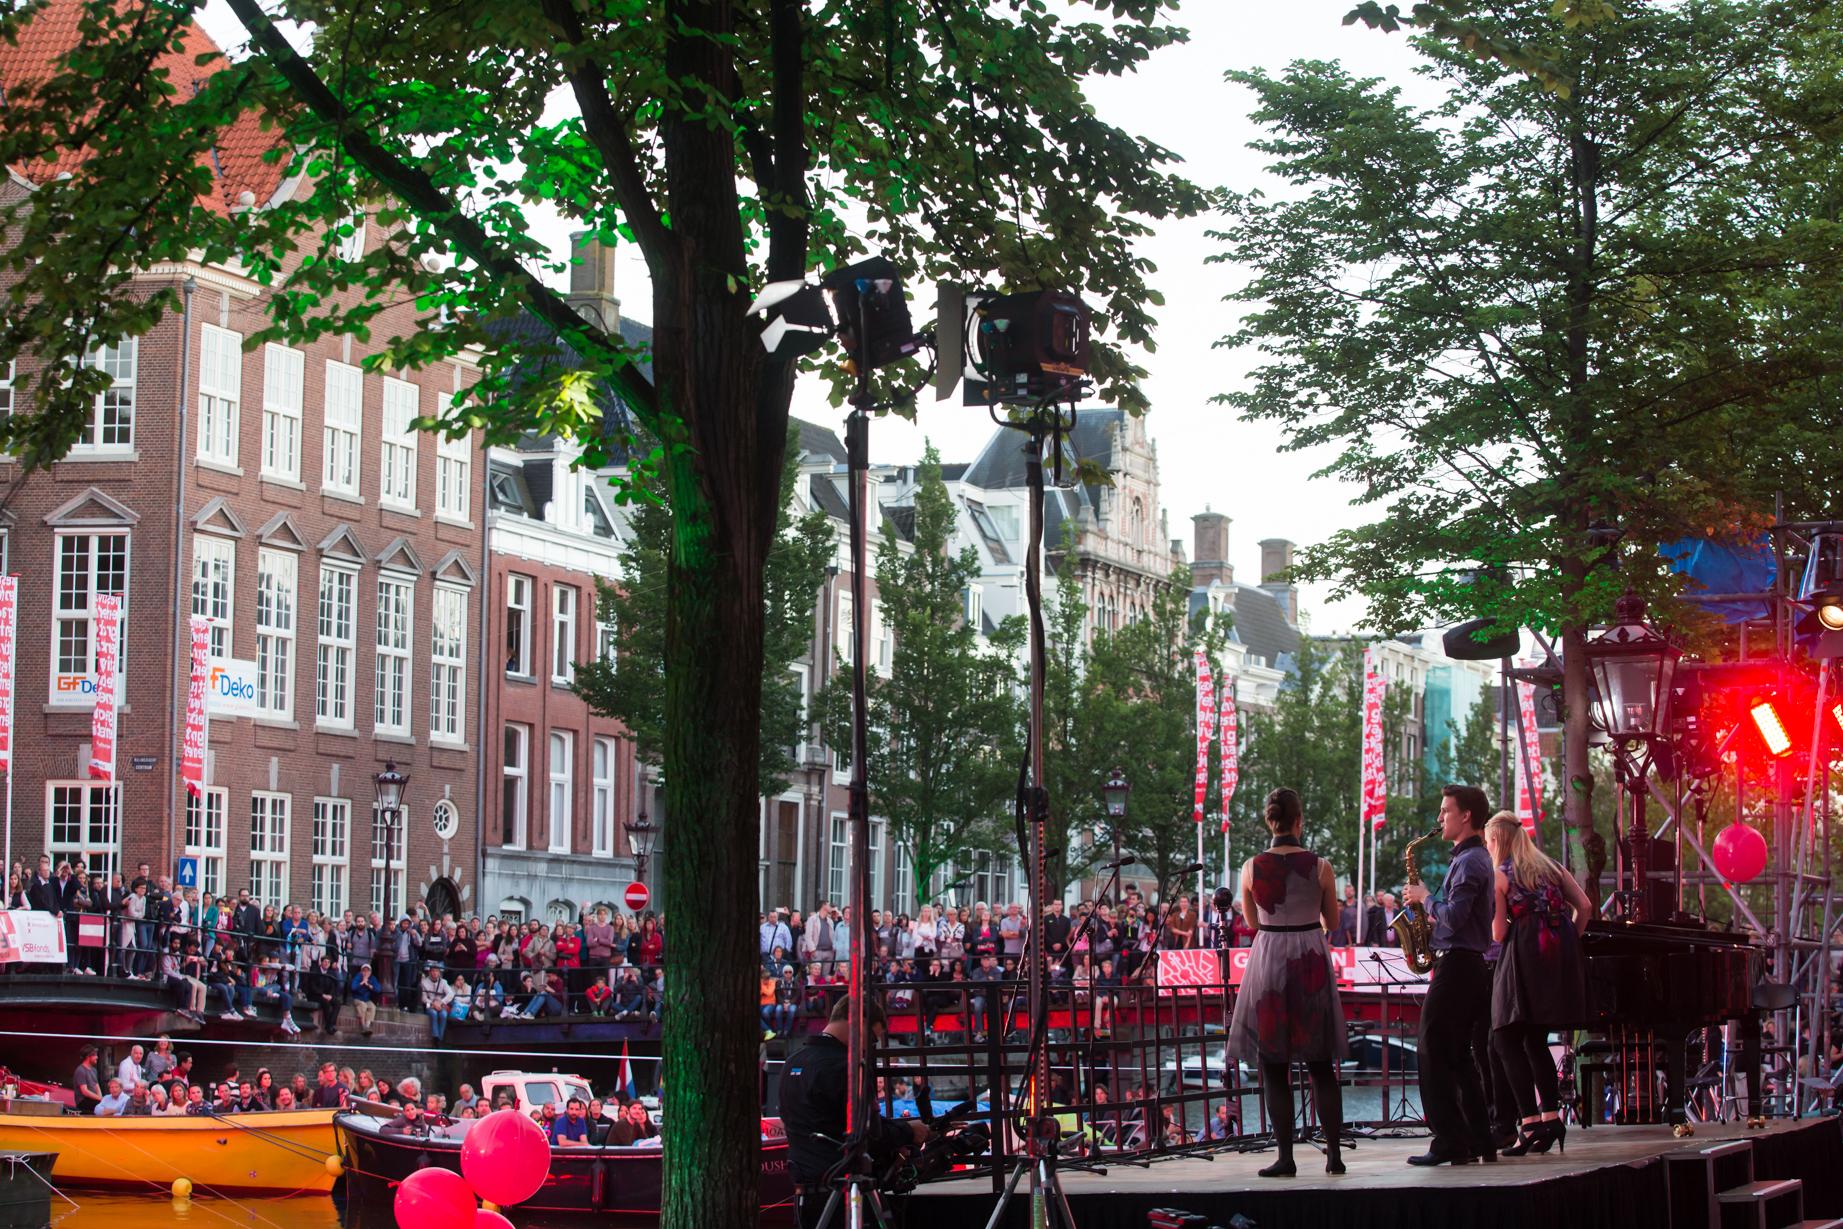 Grachtenfestival, Amsterdam 2016